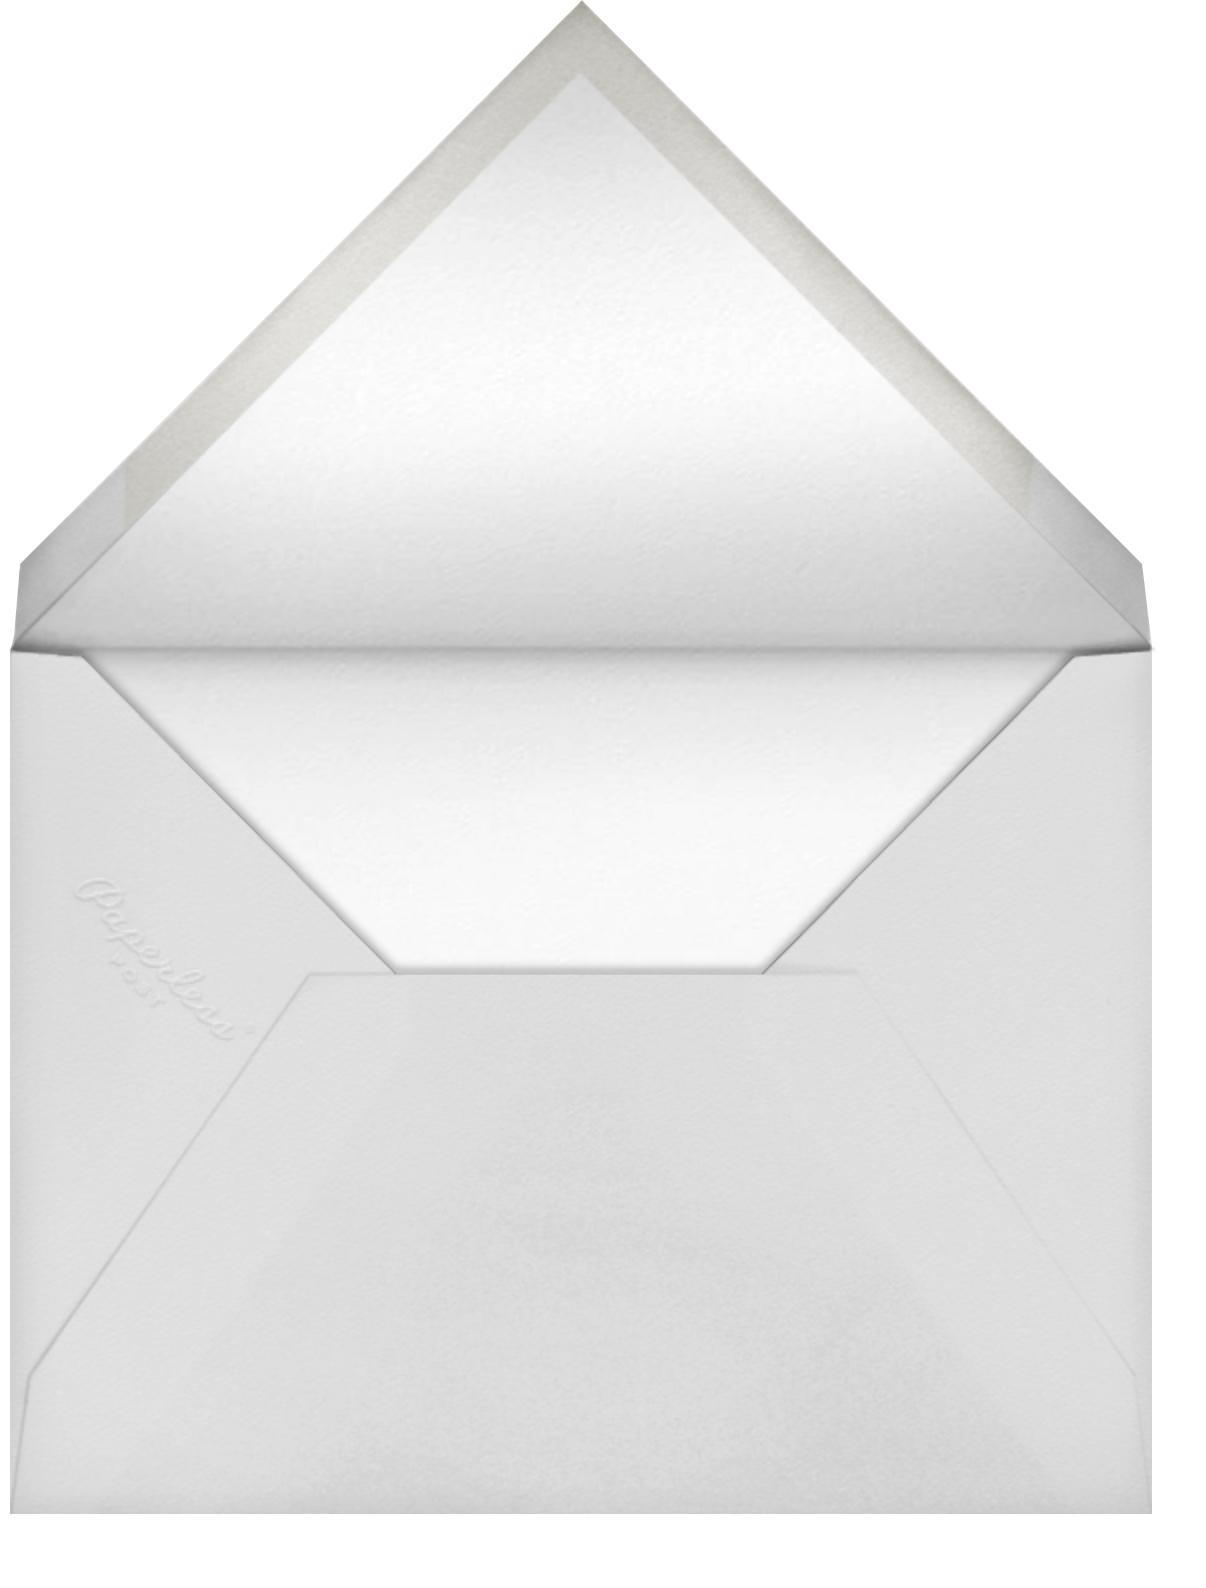 Starry First Birthday - Sugar Paper - Kids' birthday - envelope back